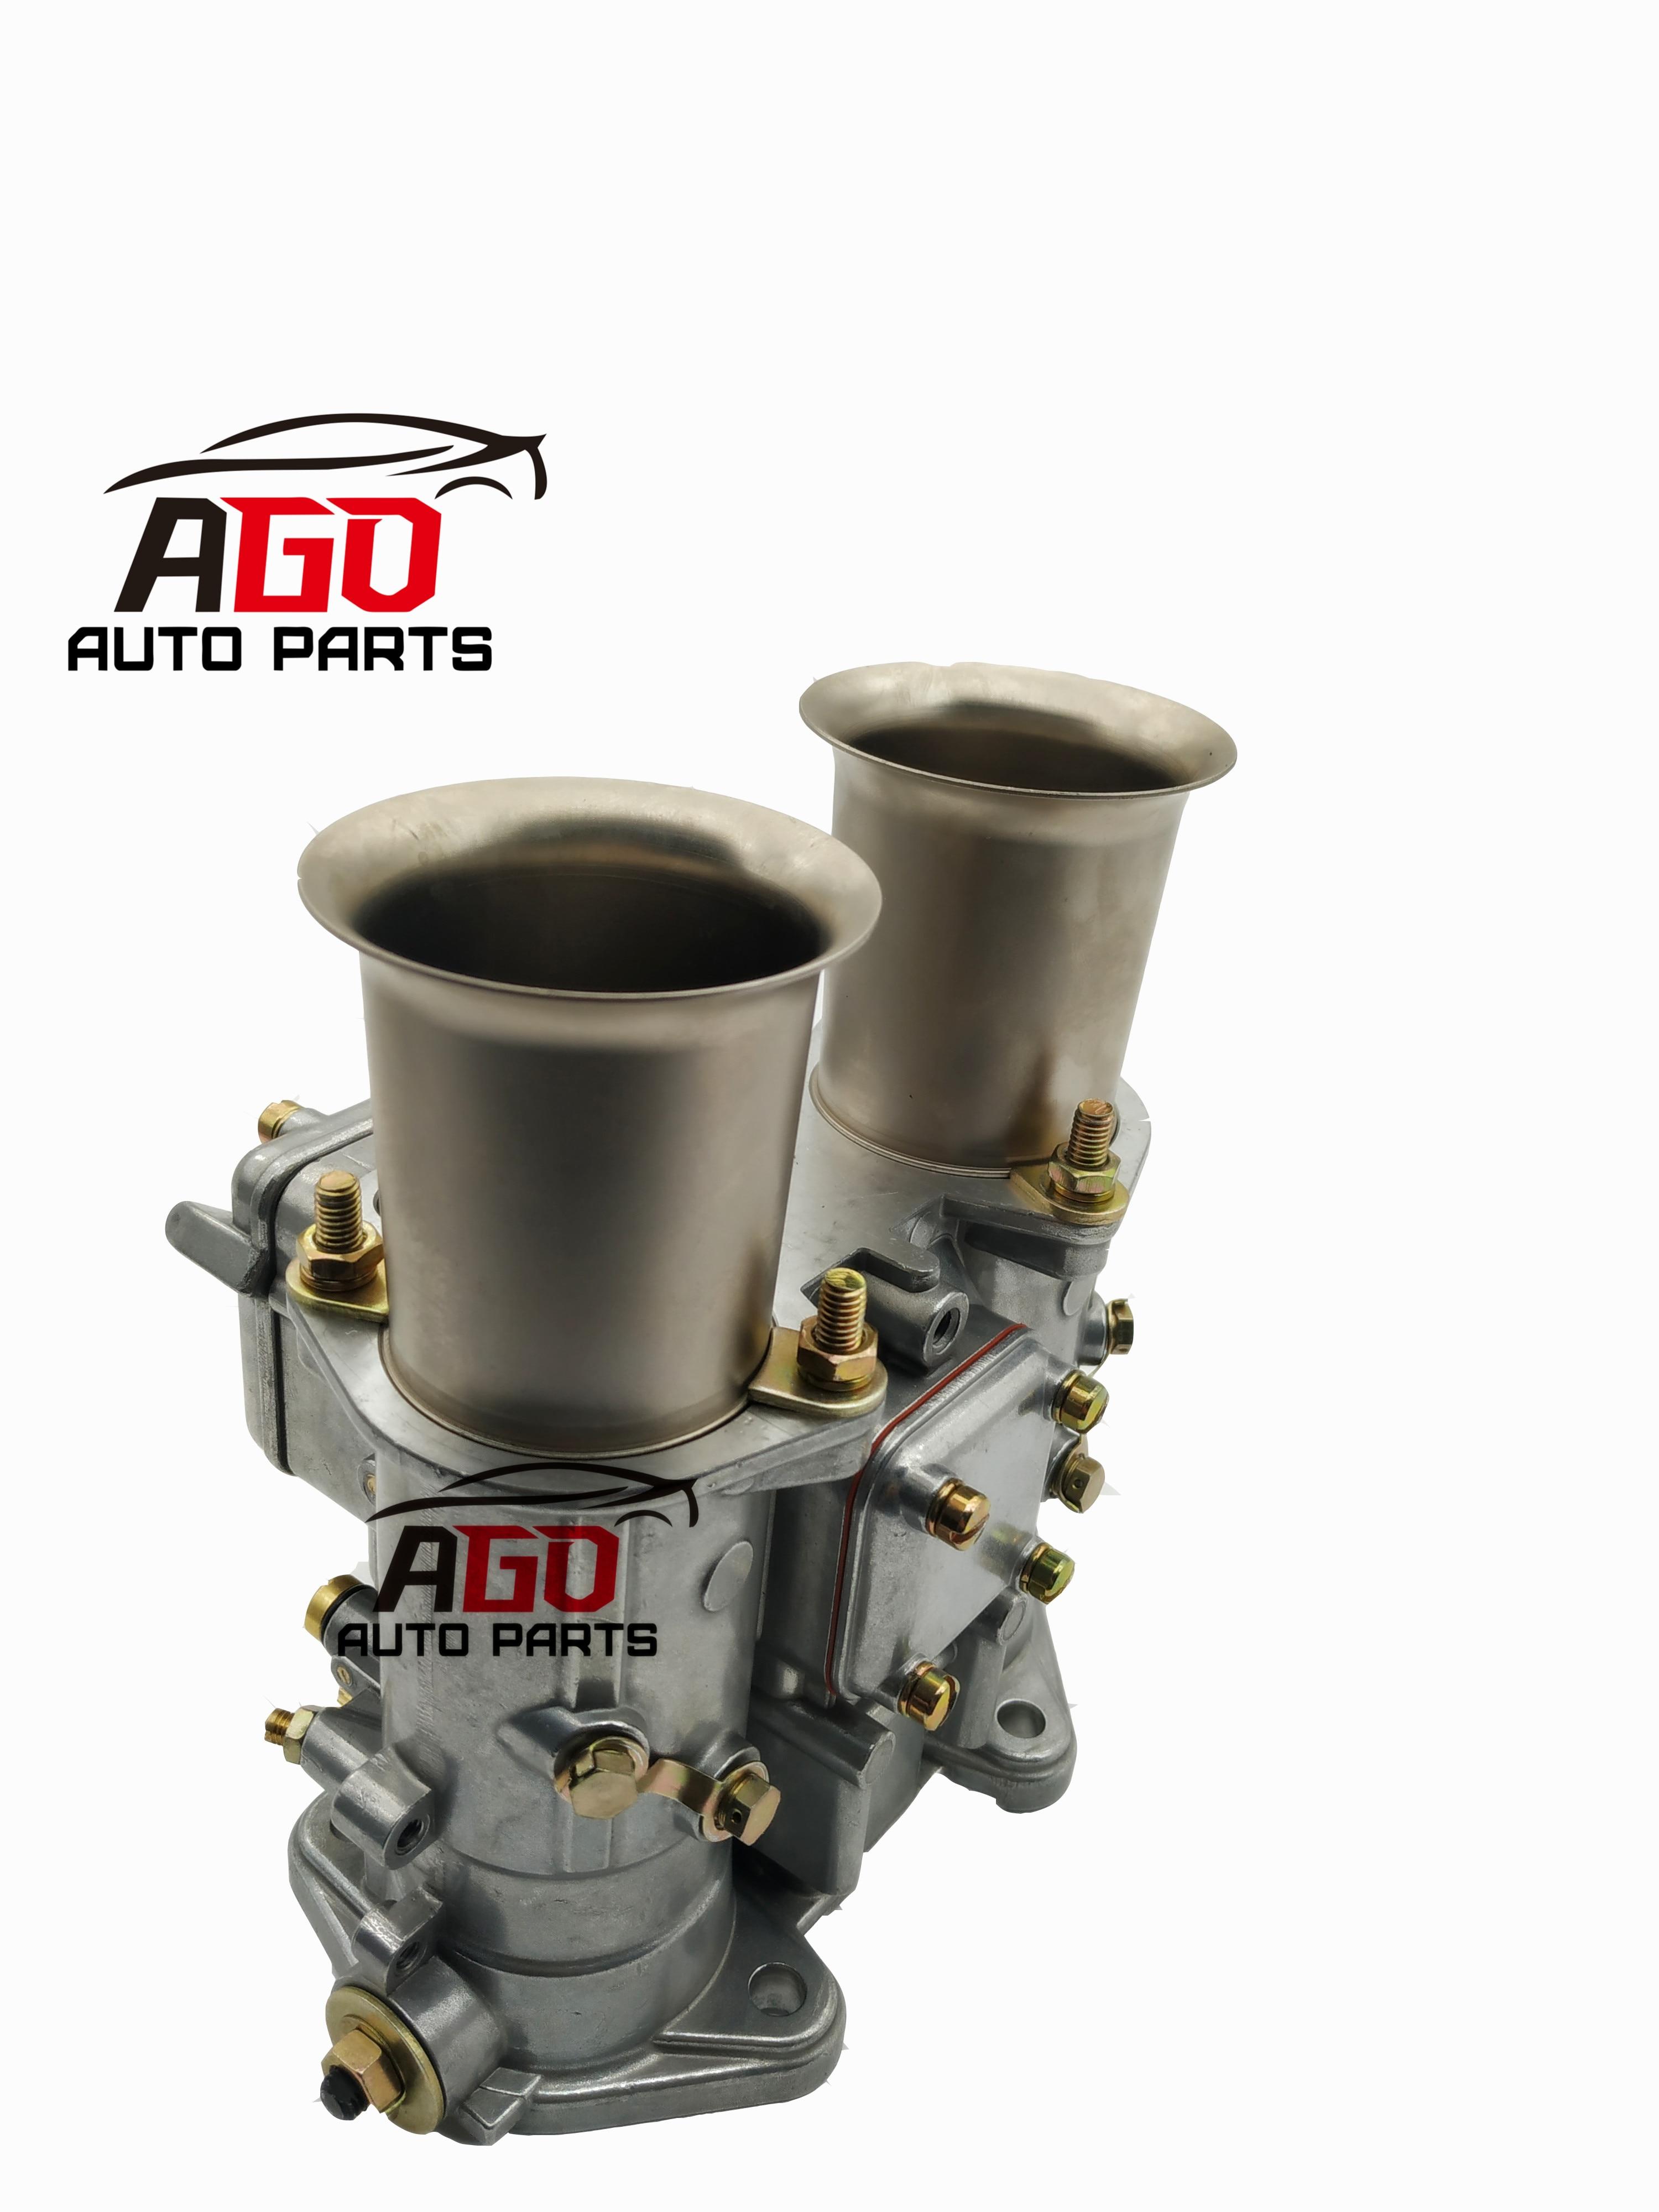 AGO New CARBURETOR FOR 40DCOE 45DCOE 48DCOE 50DCOE Carburetor Twin Choke 4 Cyl 6 Cyl or V8 Engines  - buy with discount